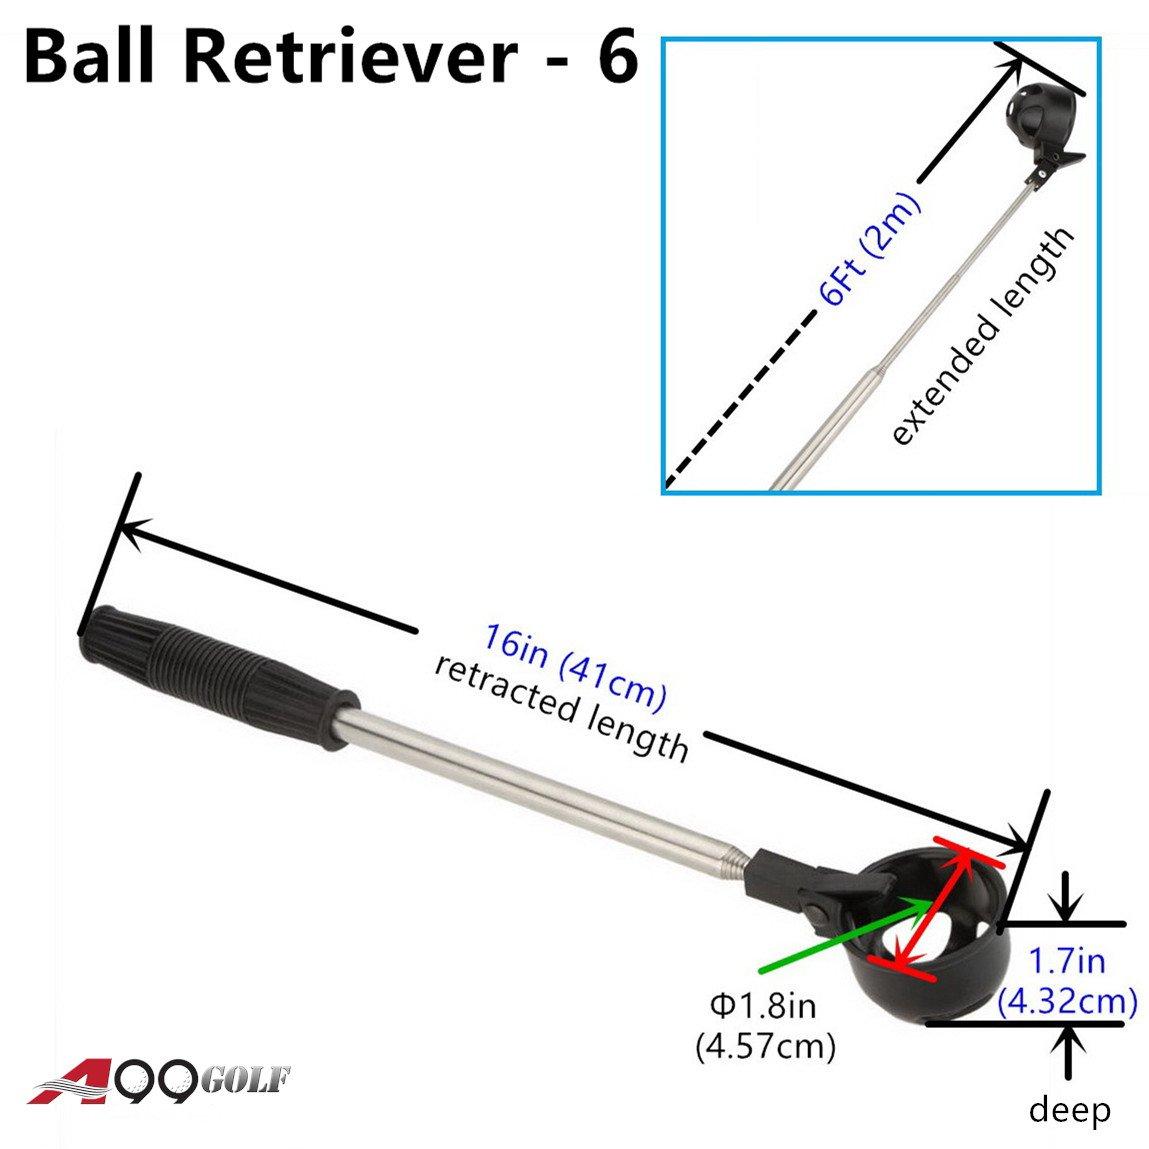 A99 Golf 6ft Telescopic Ball Retriever Pick Up Retractable Scoop Steel Shaft